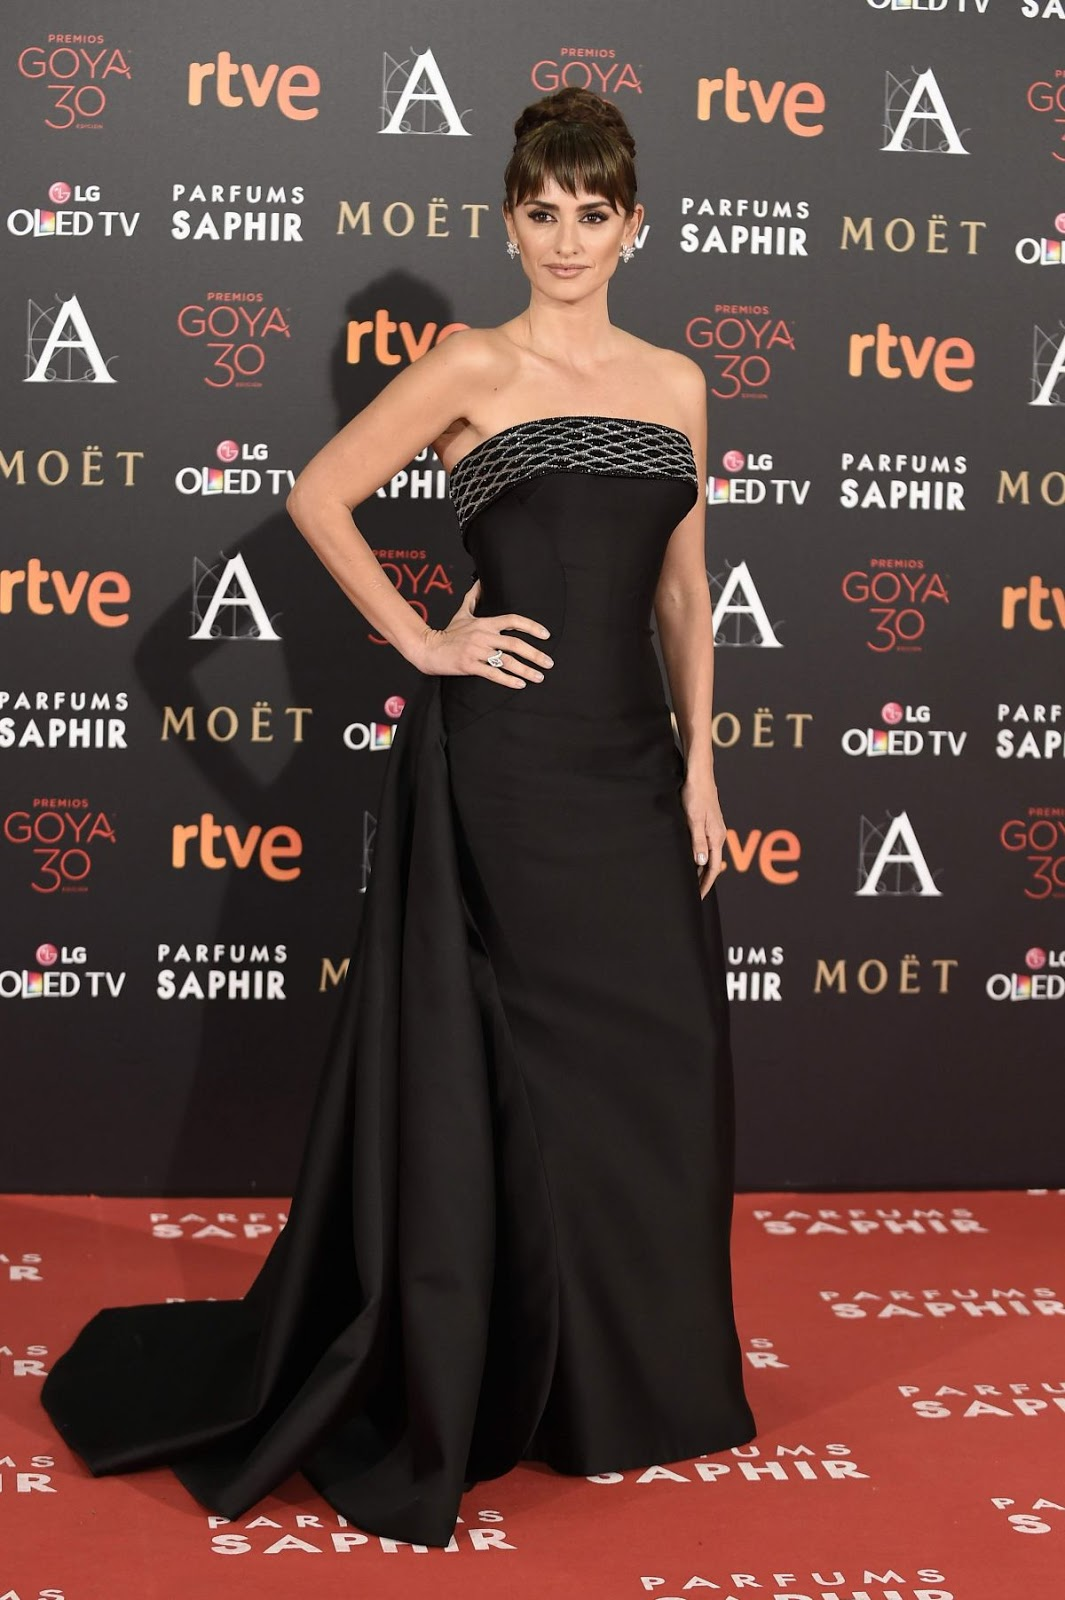 Penelope Cruz attends 30th Annual Goya Film Awards 2016